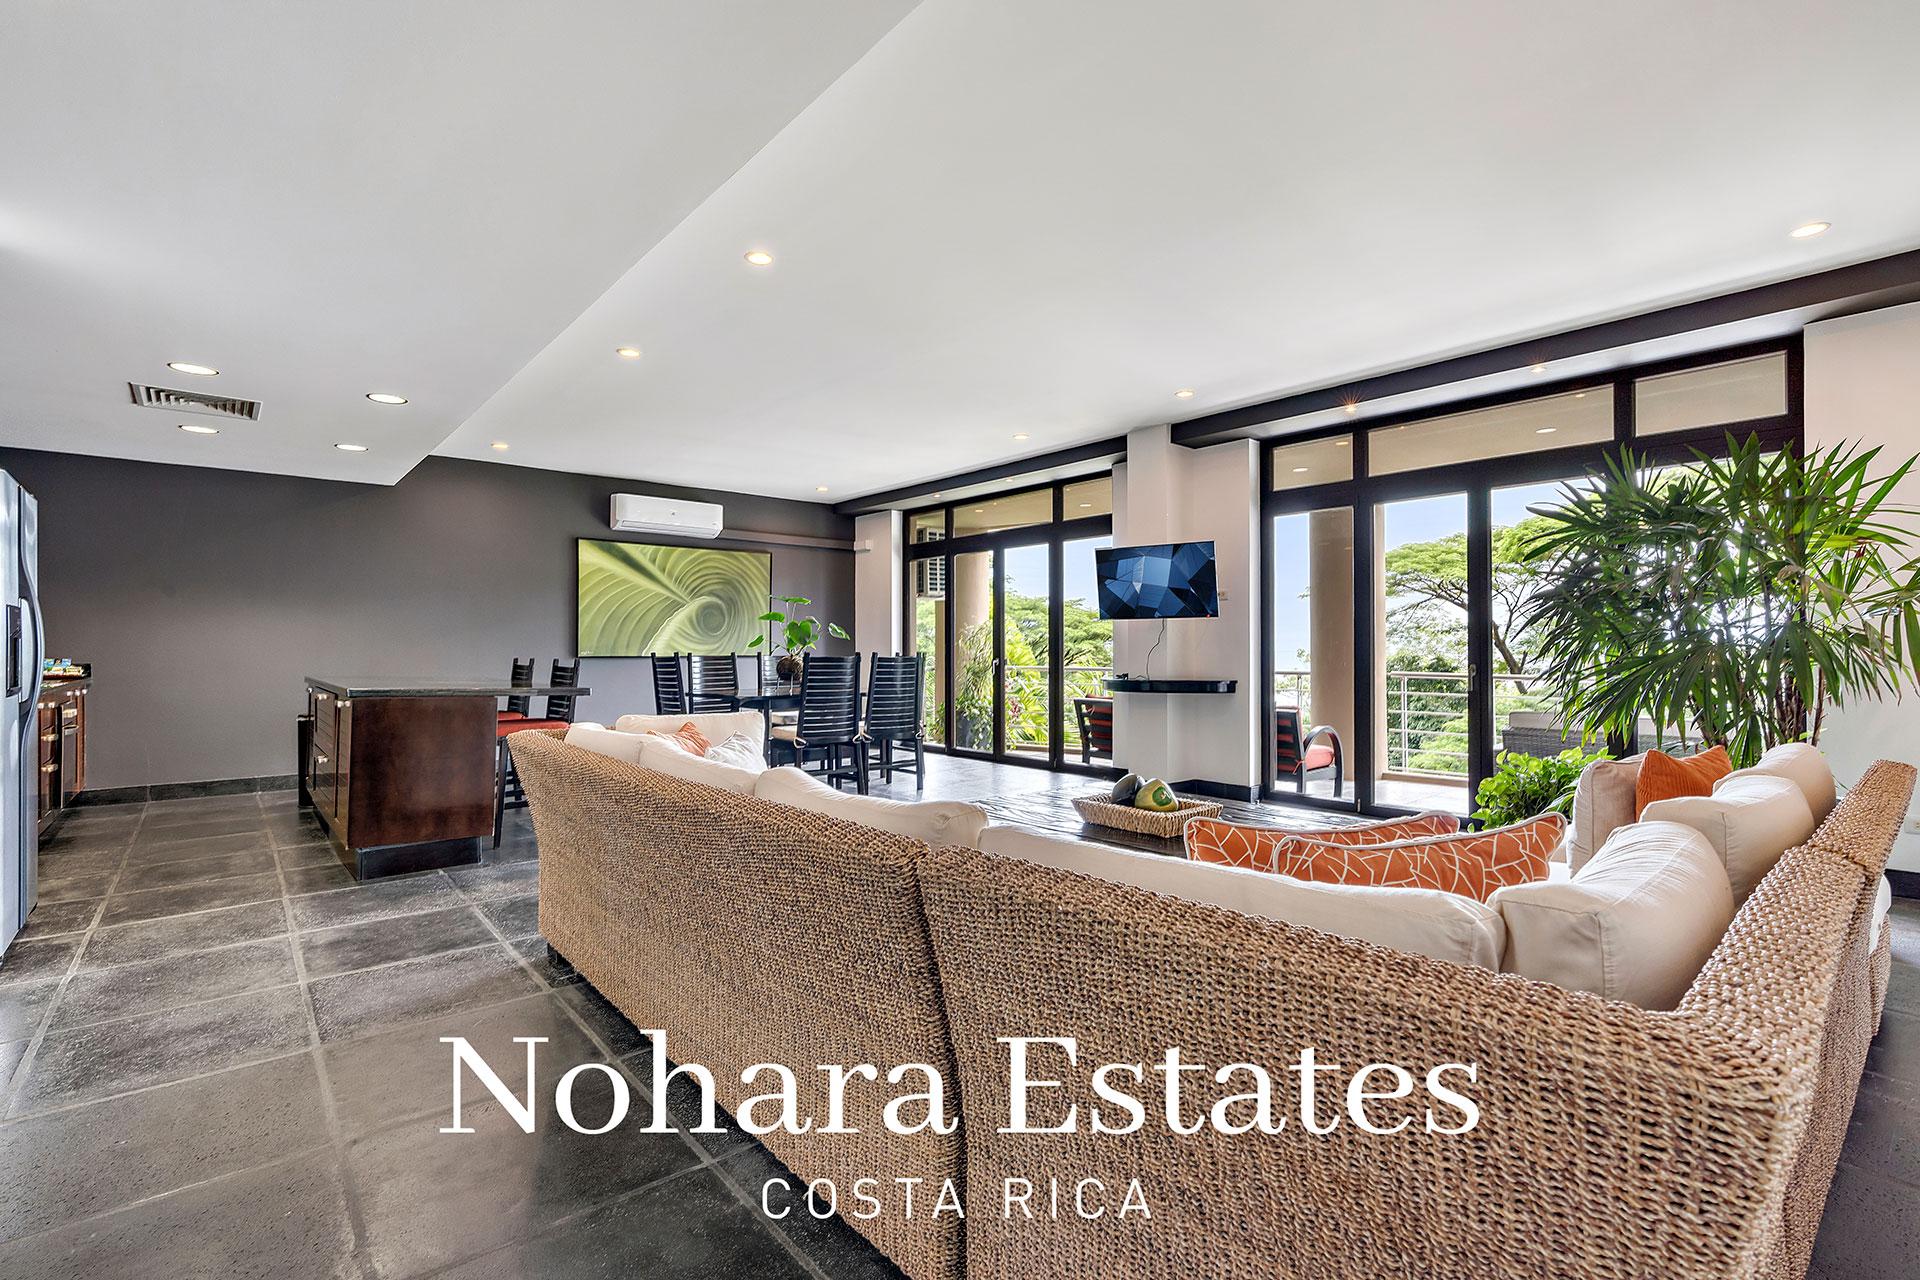 Nohara Estates Costa Rica 128 Penthouse Quepos Los Altos 8